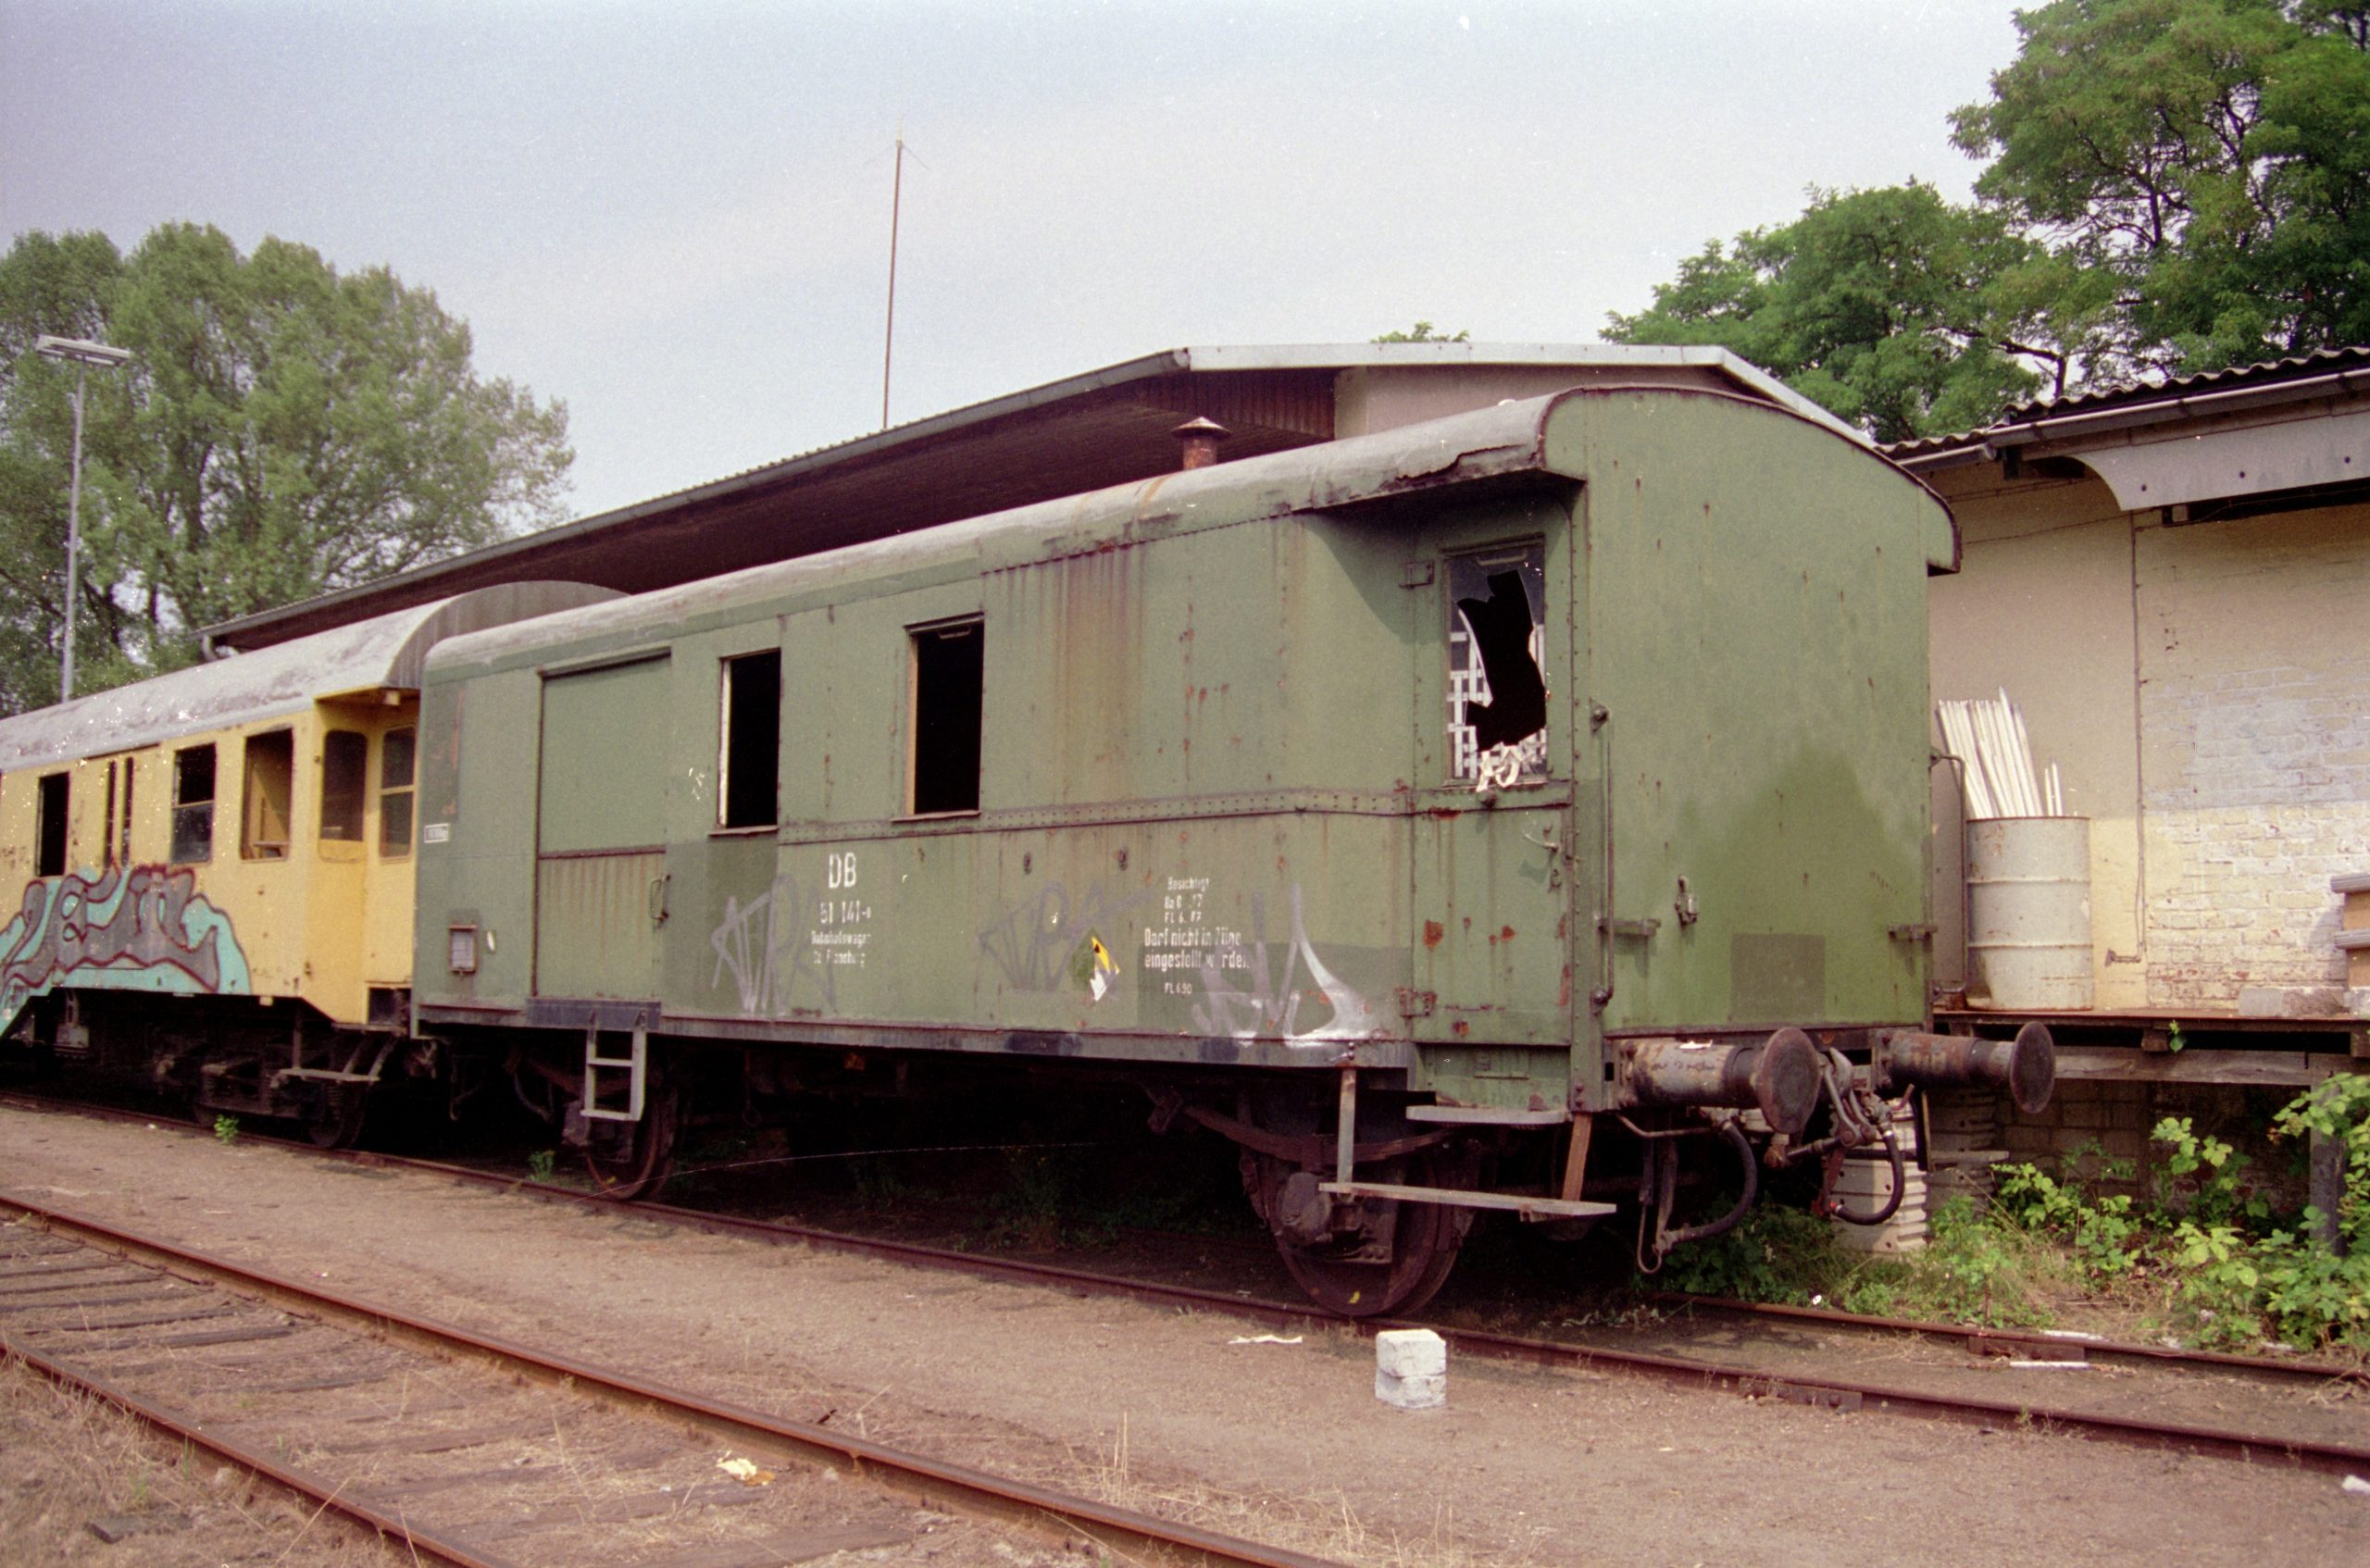 Packwagen 0125